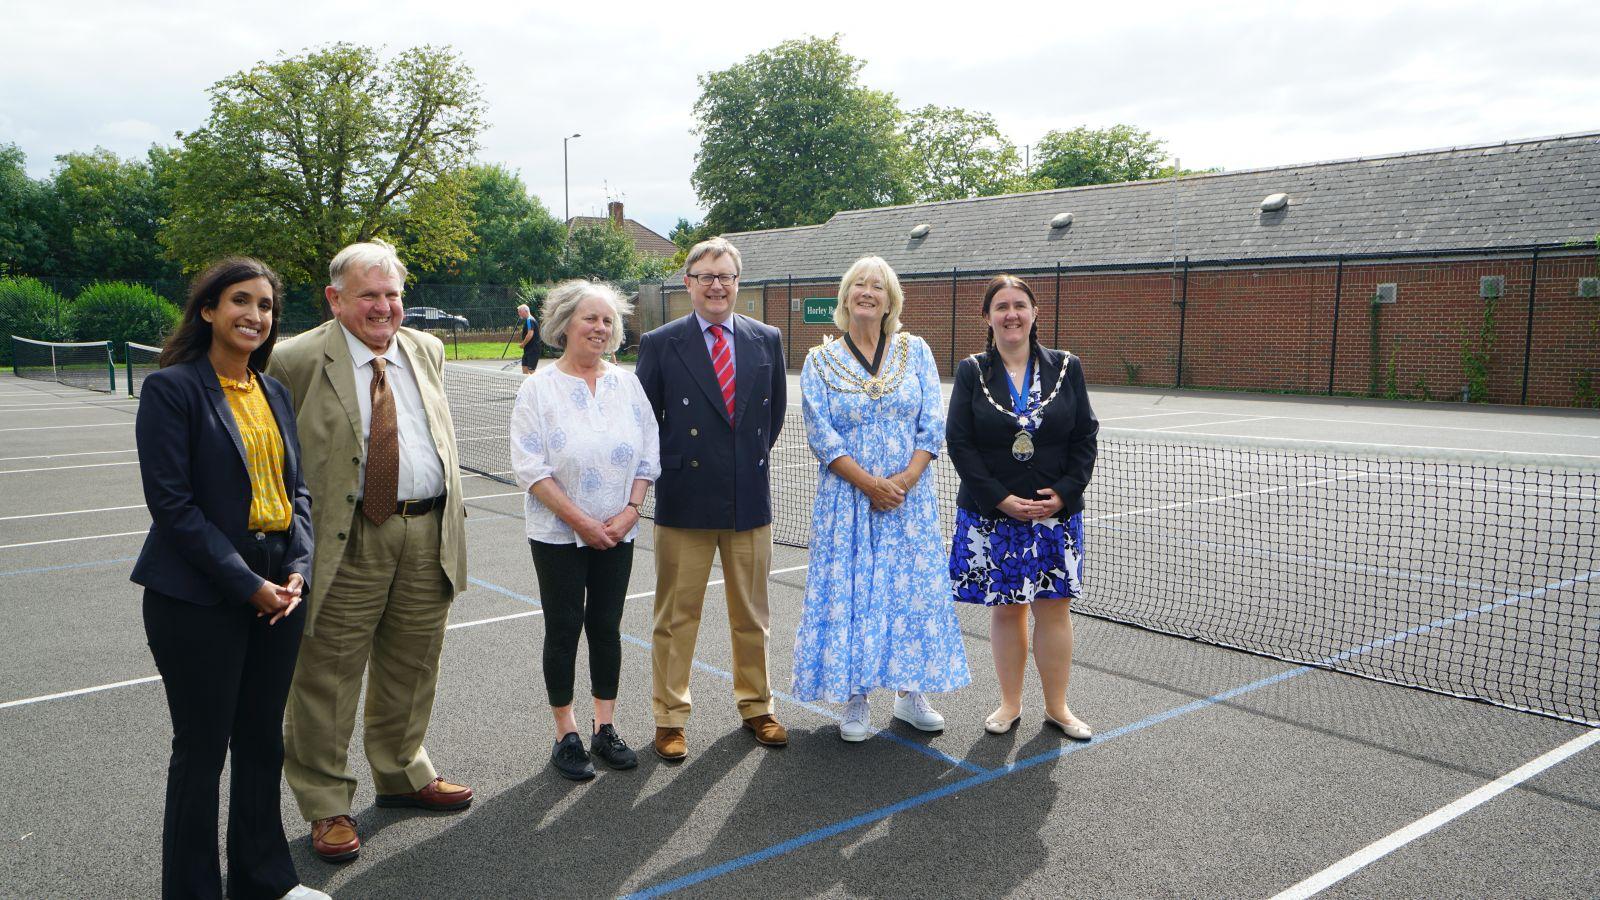 Photo of Refurbished tennis court